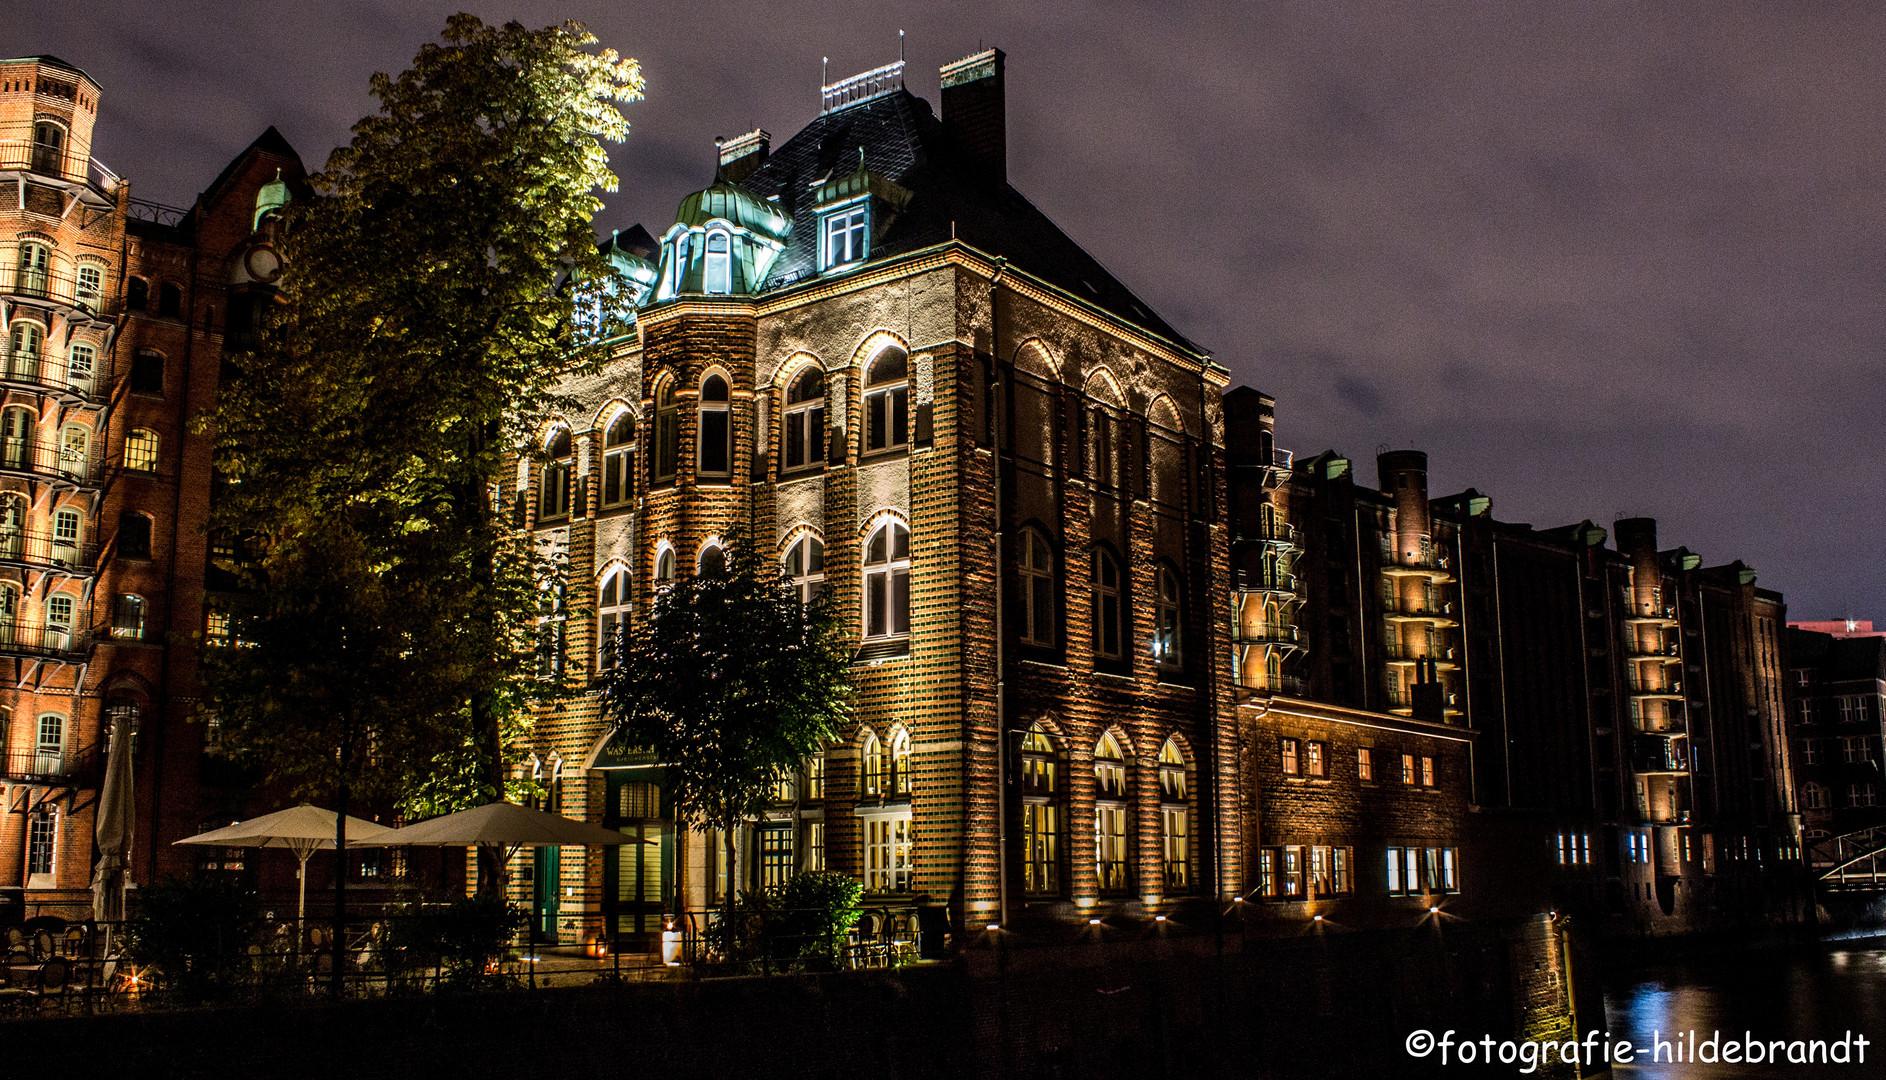 Wasserschloss Speicherstadt